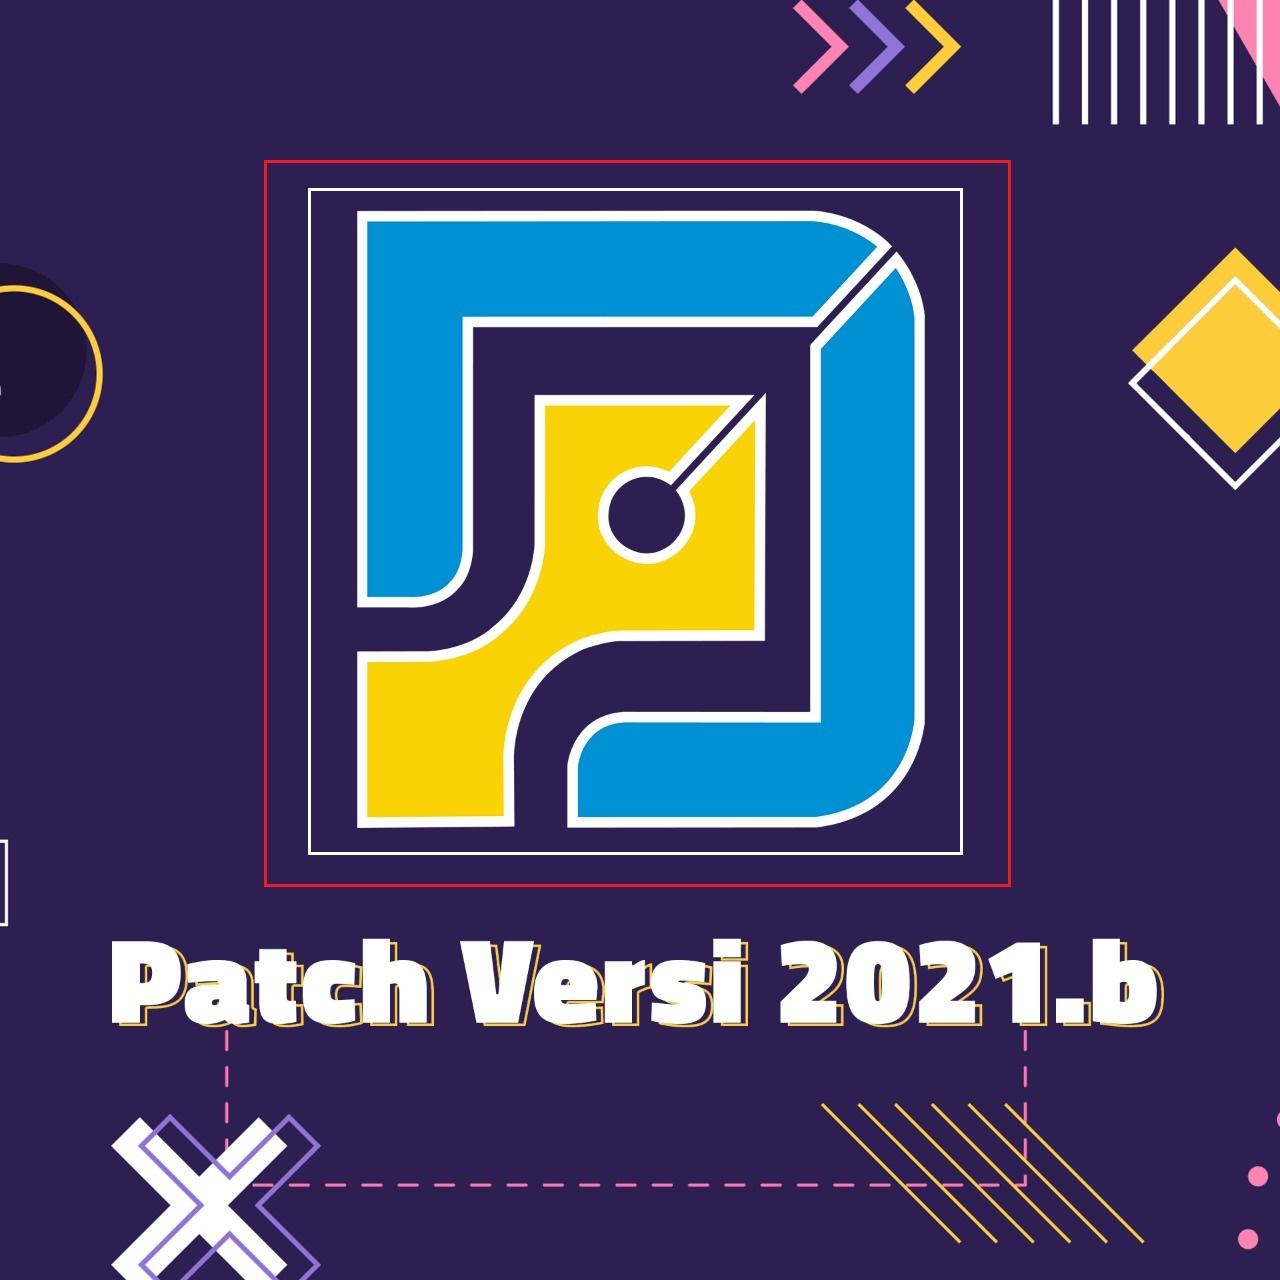 Rilis Pembaruan Aplikasi Dapodik Patch Versi 2021.b ...